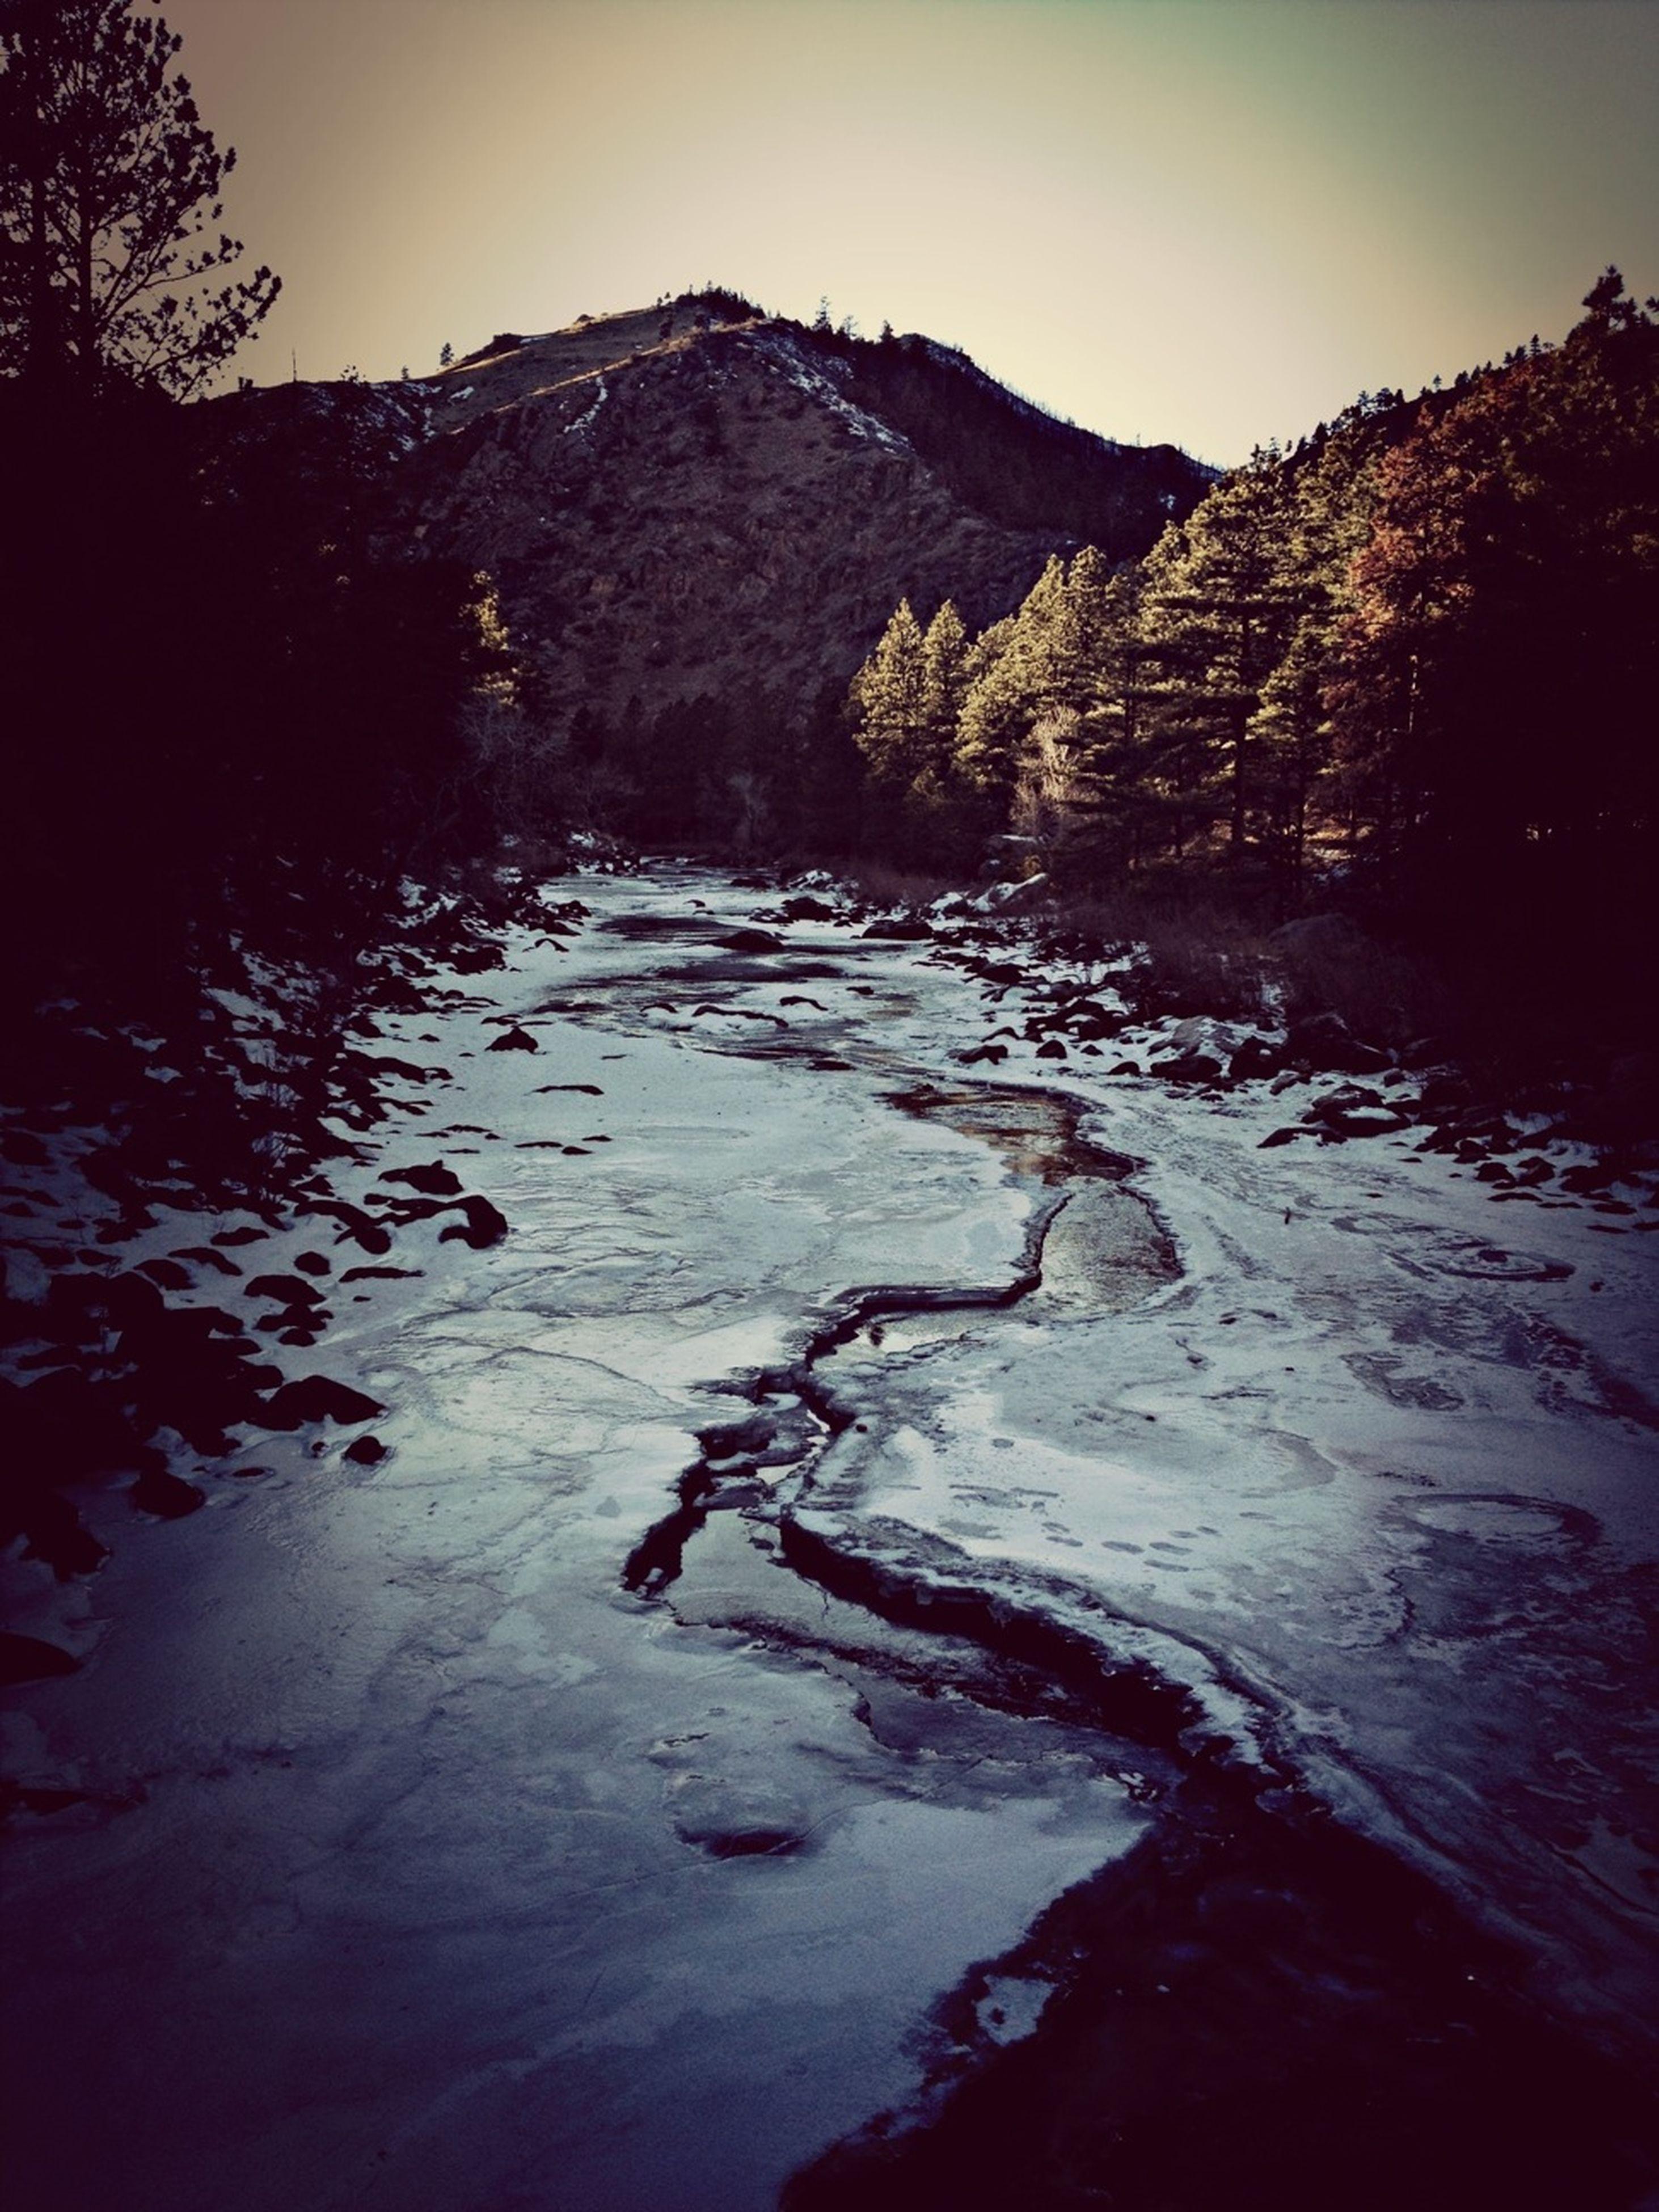 mountain, tranquil scene, tranquility, water, scenics, beauty in nature, snow, mountain range, nature, winter, lake, cold temperature, tree, landscape, non-urban scene, river, clear sky, sky, idyllic, remote